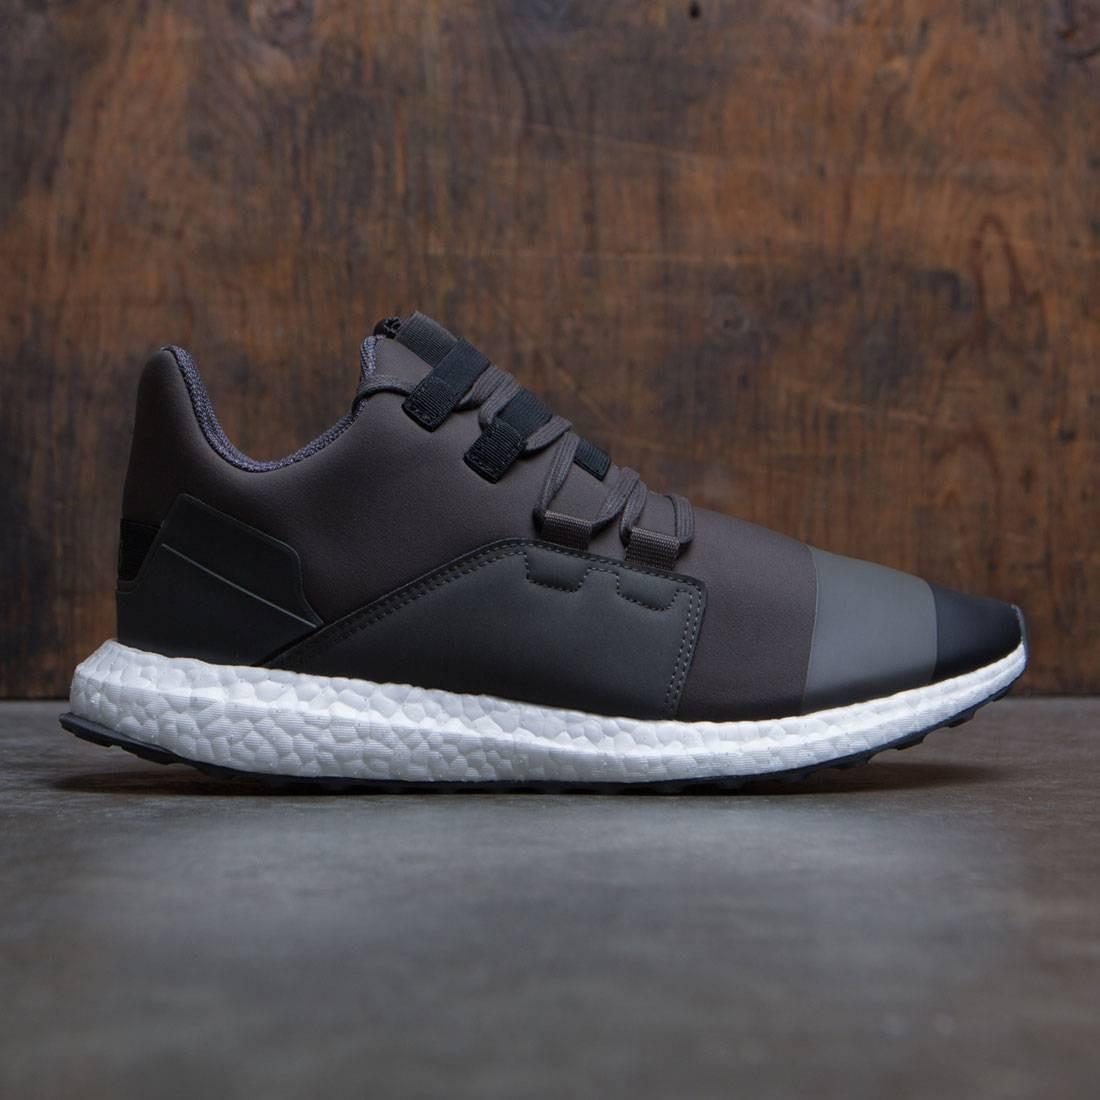 Adidas Y-3 Men Kozoko Low (olive / black olive / core black)